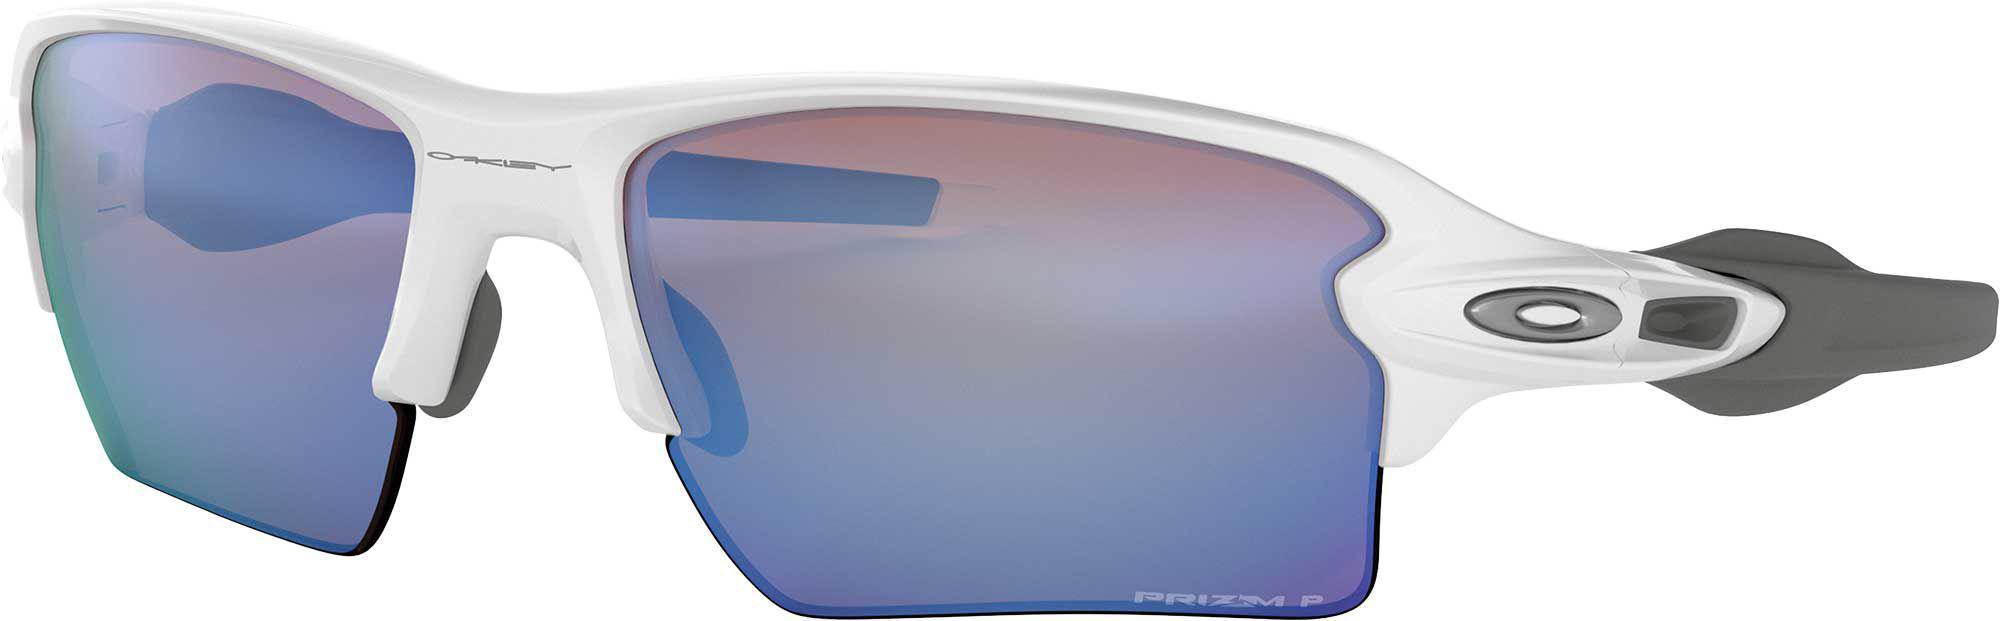 adc08dfb18 Oakley - Multicolor Flak 2.0 Xl Polarized Sunglasses for Men - Lyst